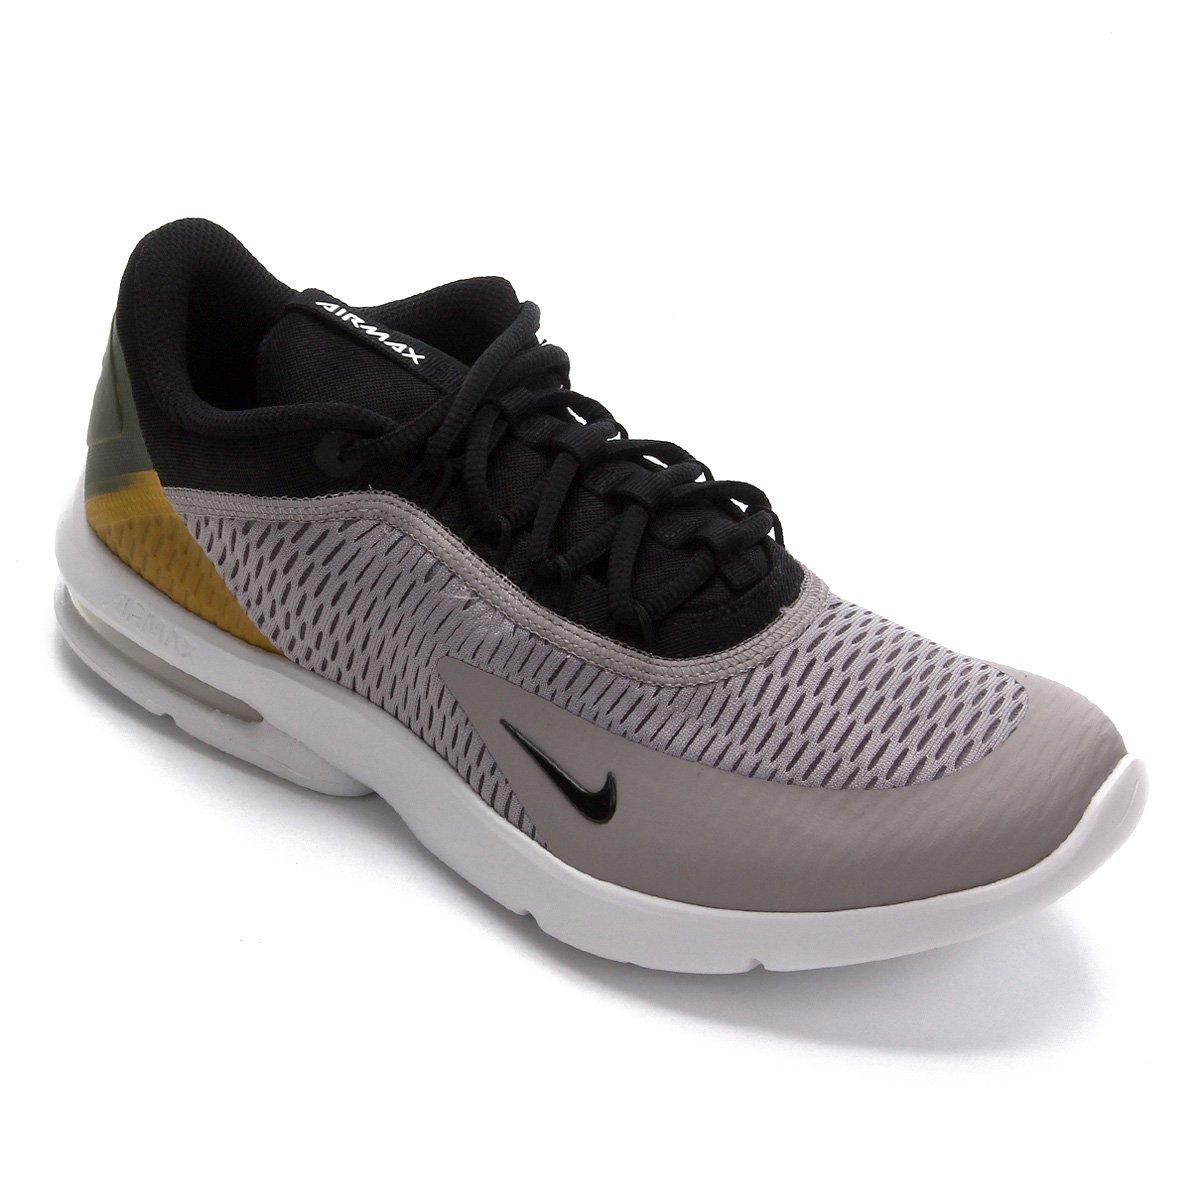 Tênis Nike Air Max Advantage 3 Masculino Preto e Dourado